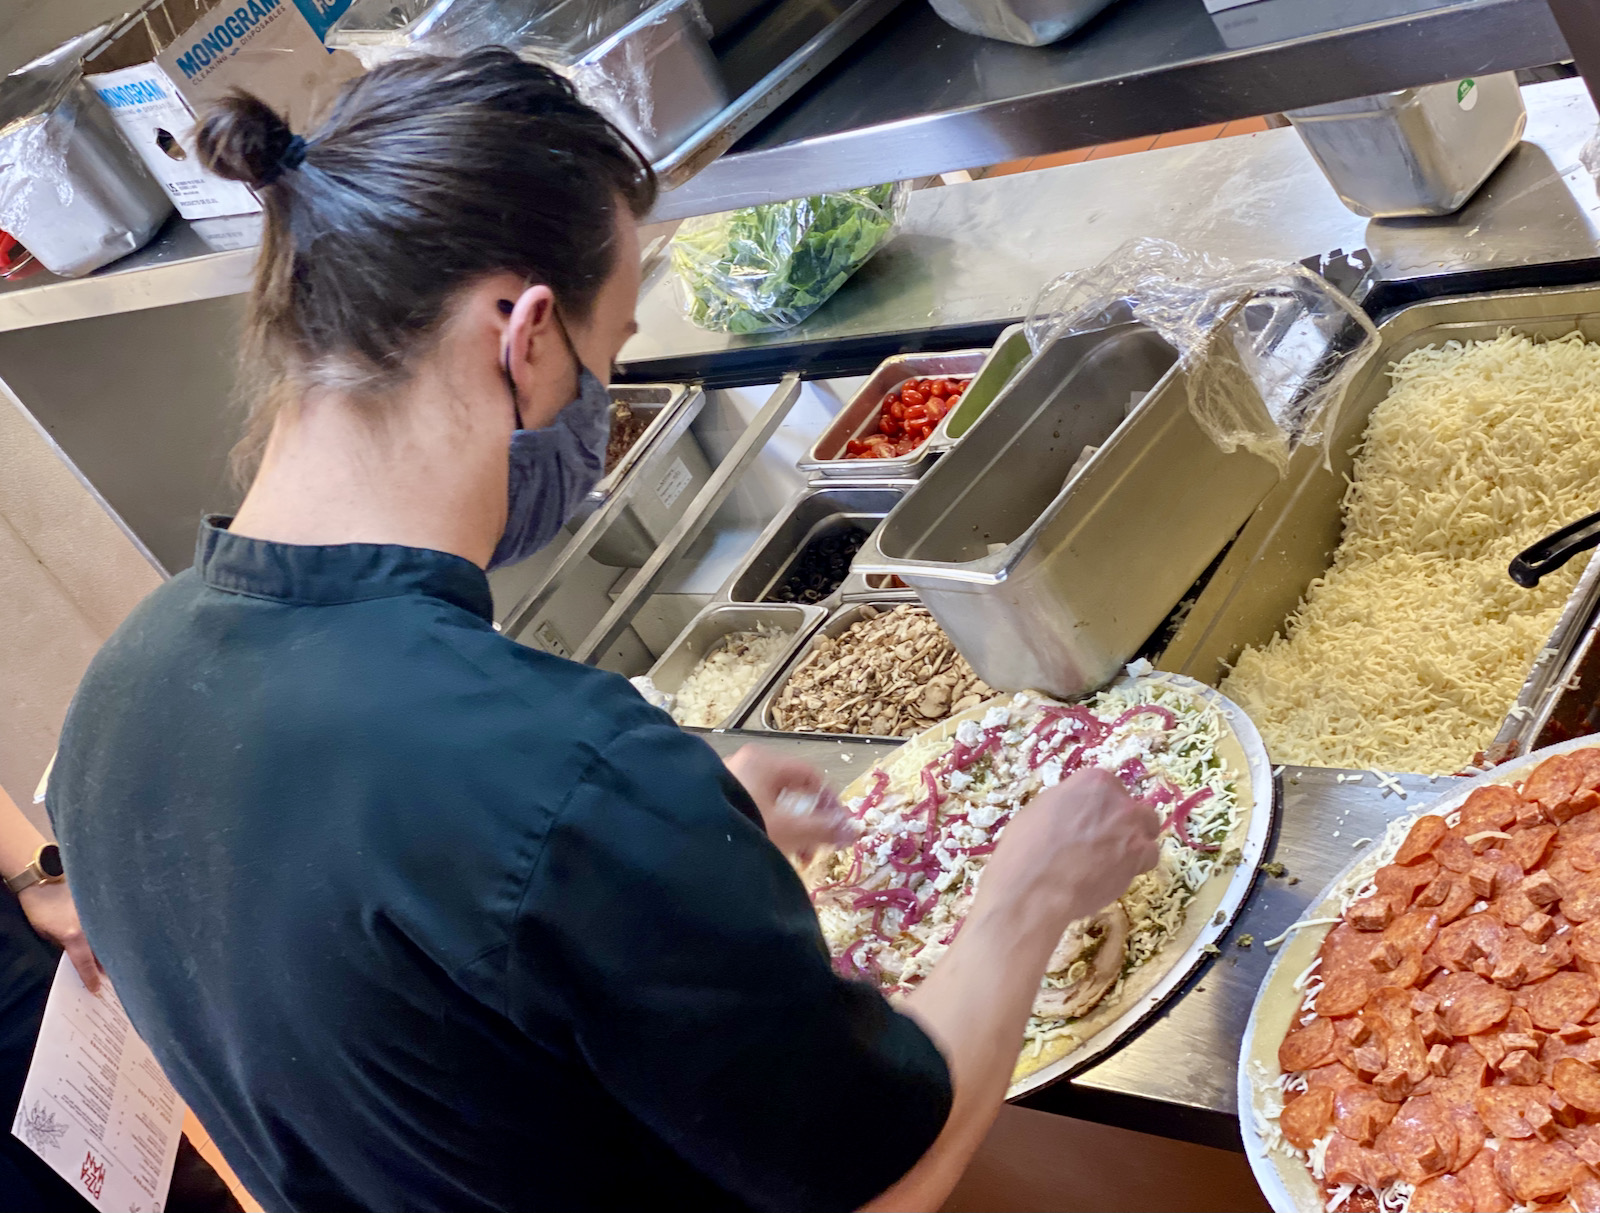 Jesse Wendel making pizzas